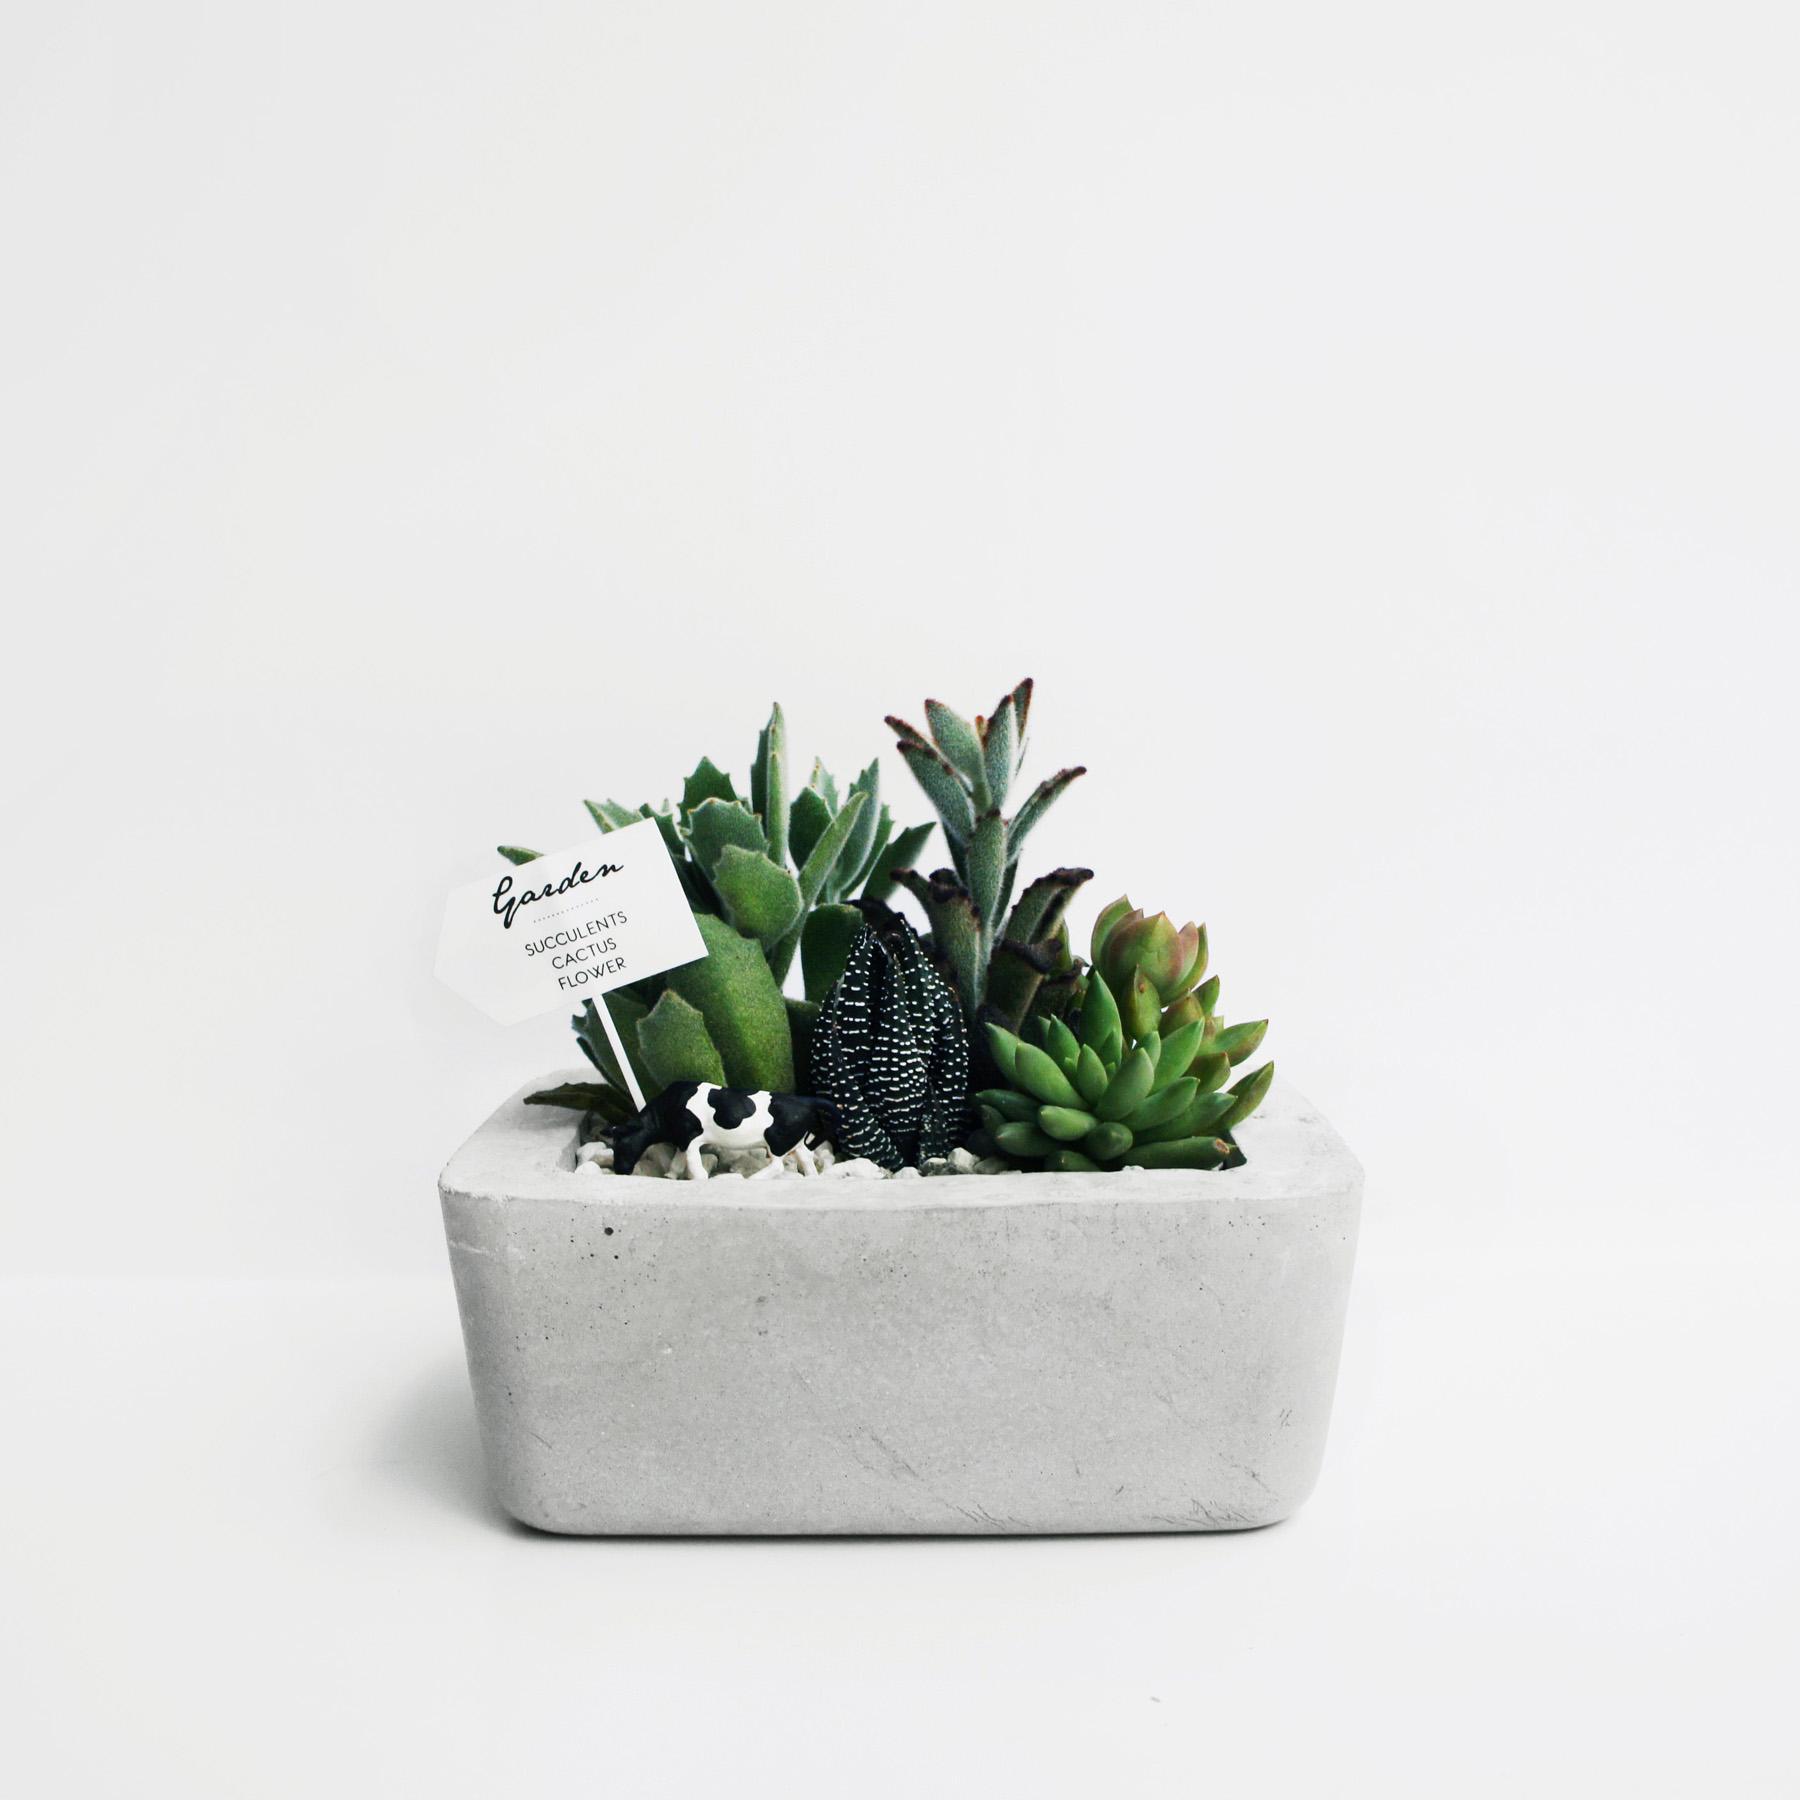 ISLAND 島嶼矩形圓角水泥盆栽・多肉/仙人掌組盆・禮物